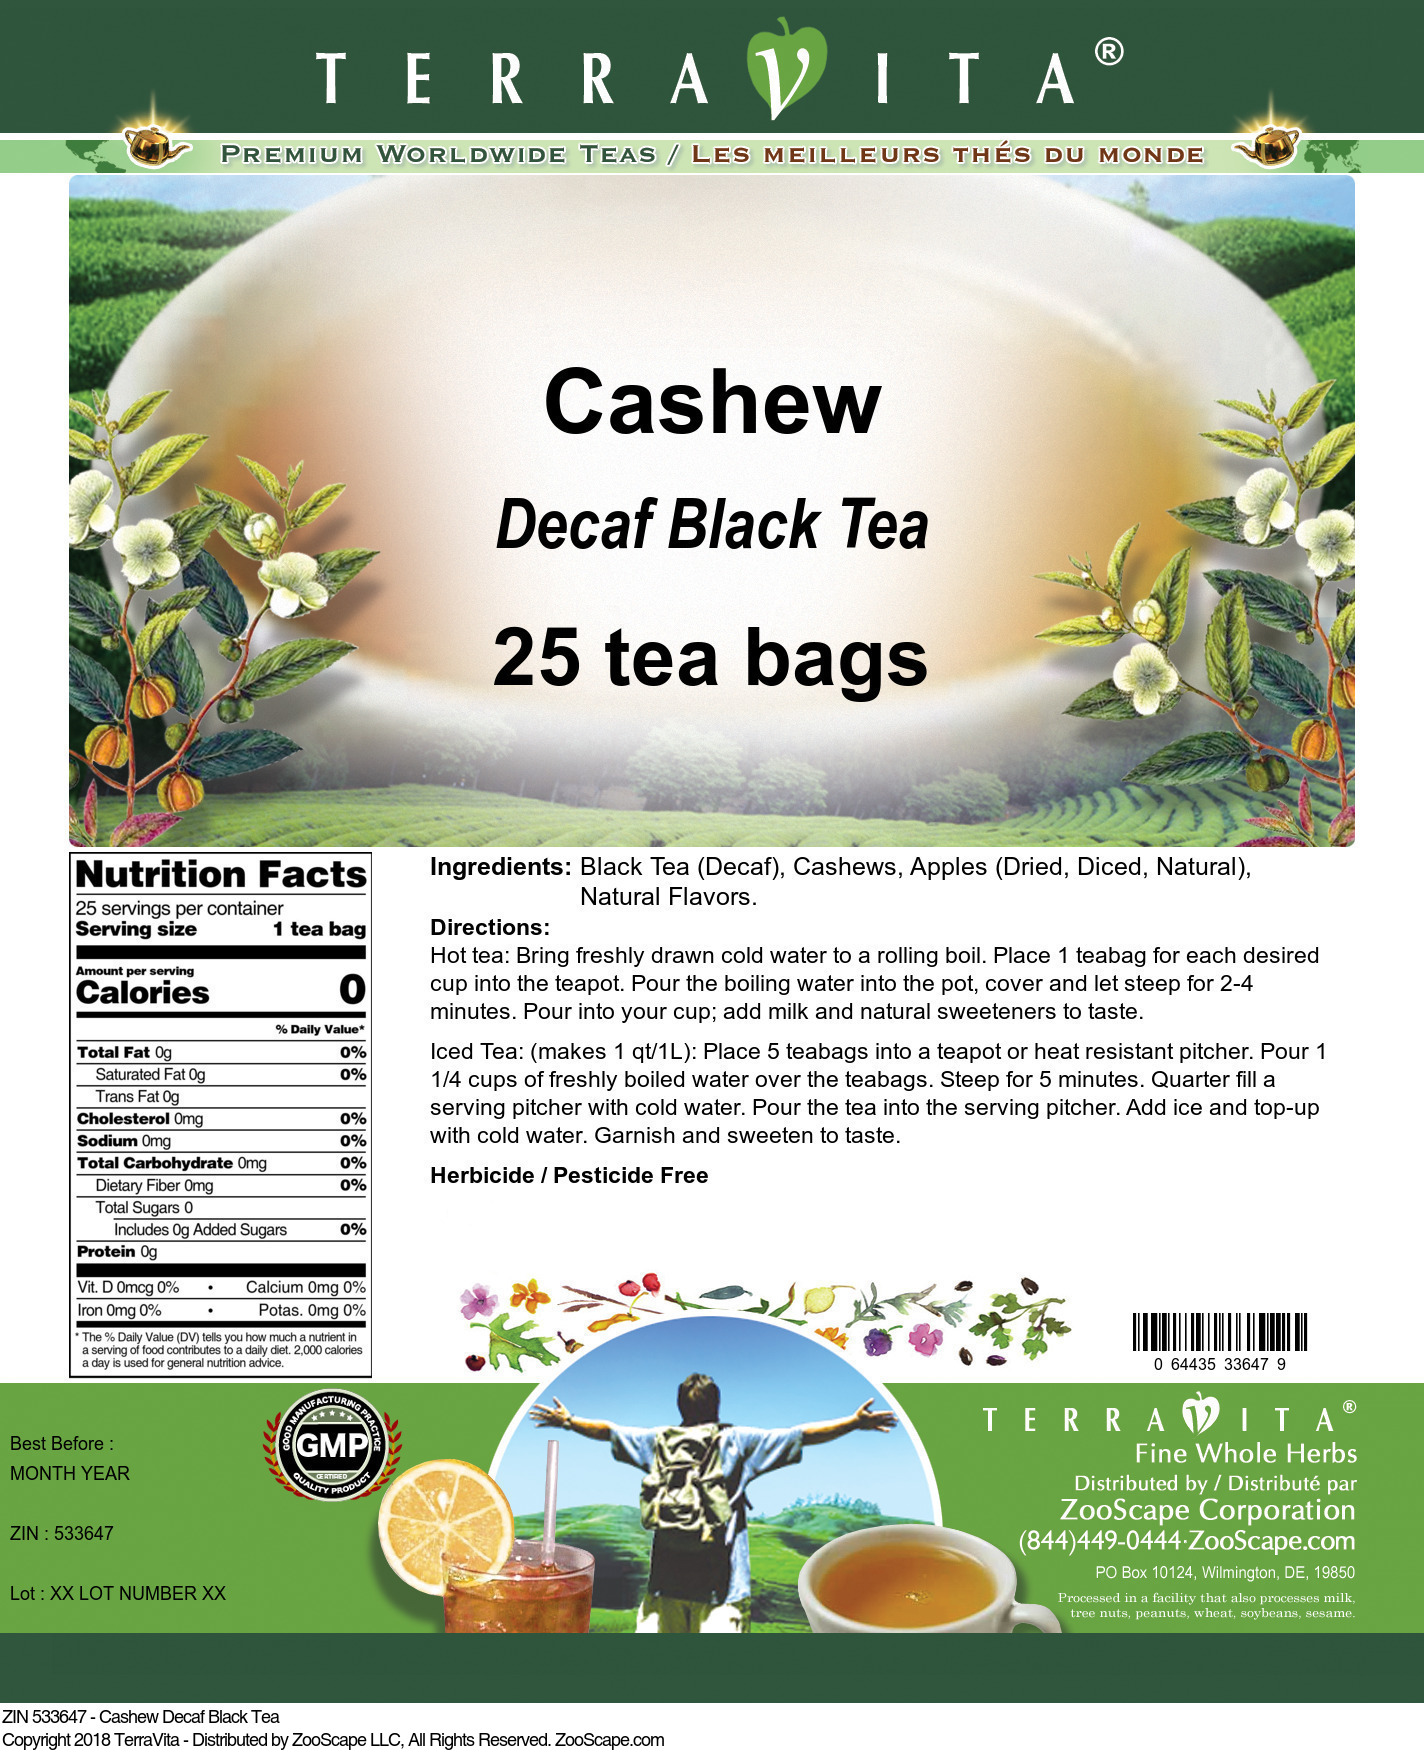 Cashew Decaf Black Tea